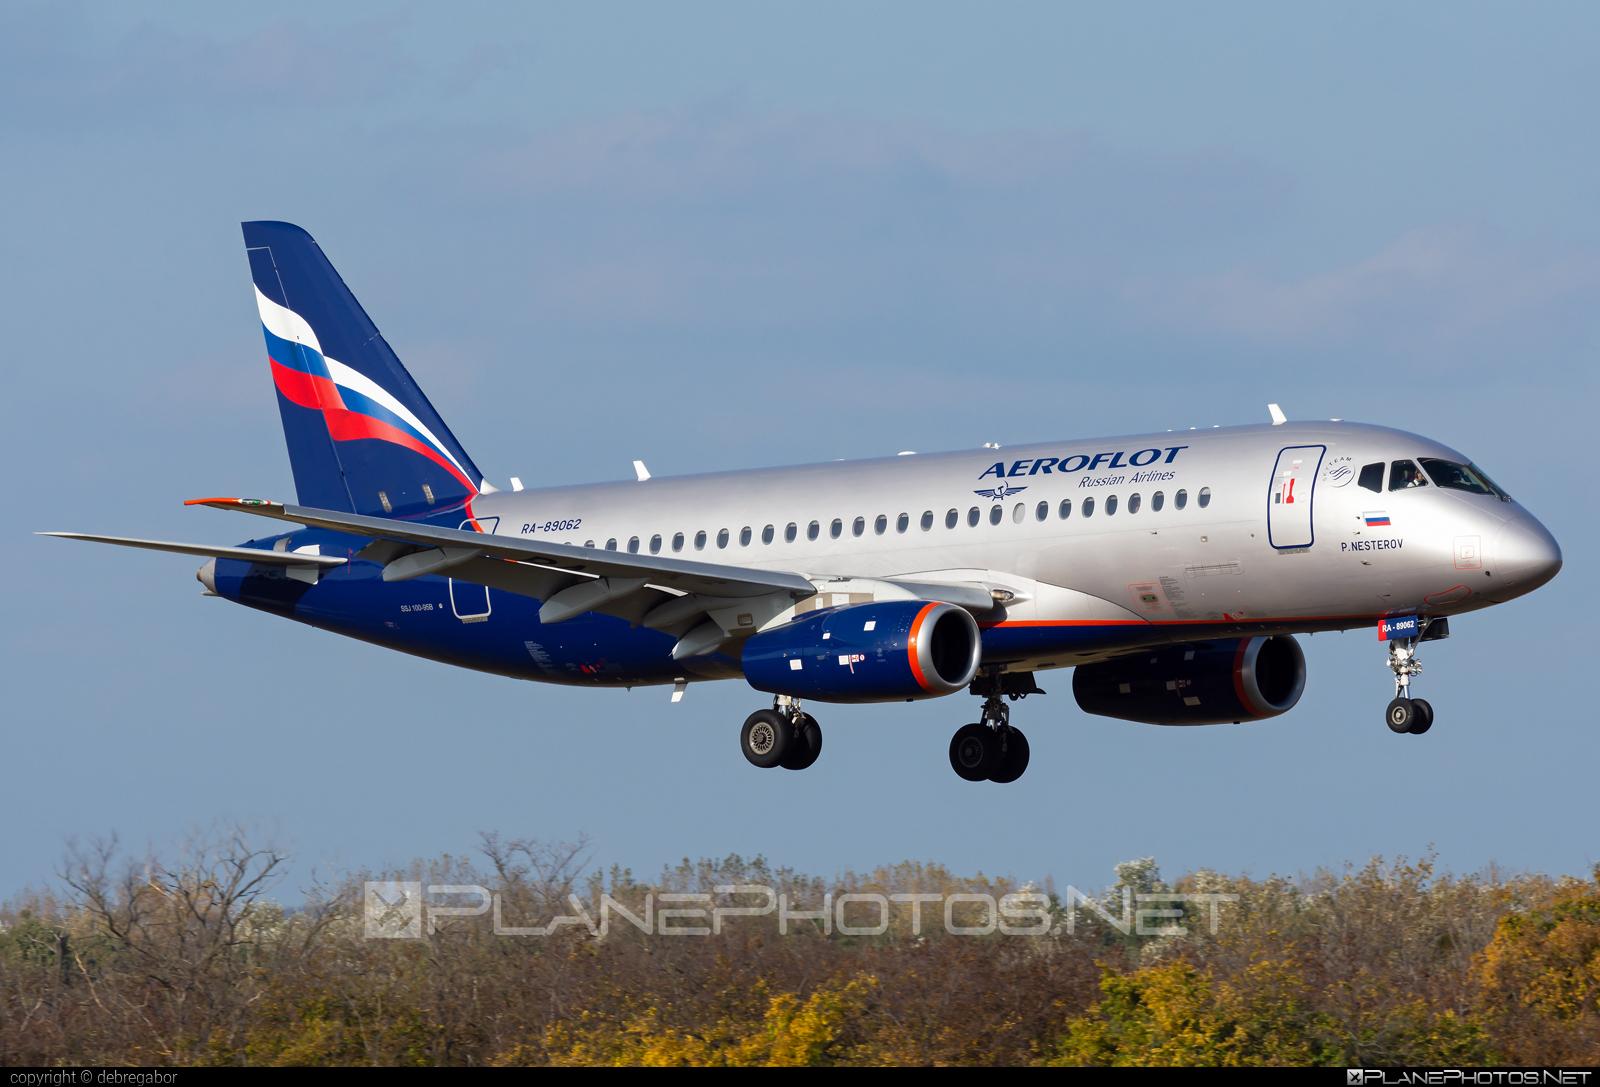 Sukhoi SSJ 100-95B Superjet - RA-89062 operated by Aeroflot #aeroflot #ssj100 #ssj10095b #sukhoi #sukhoisuperjet #superjet